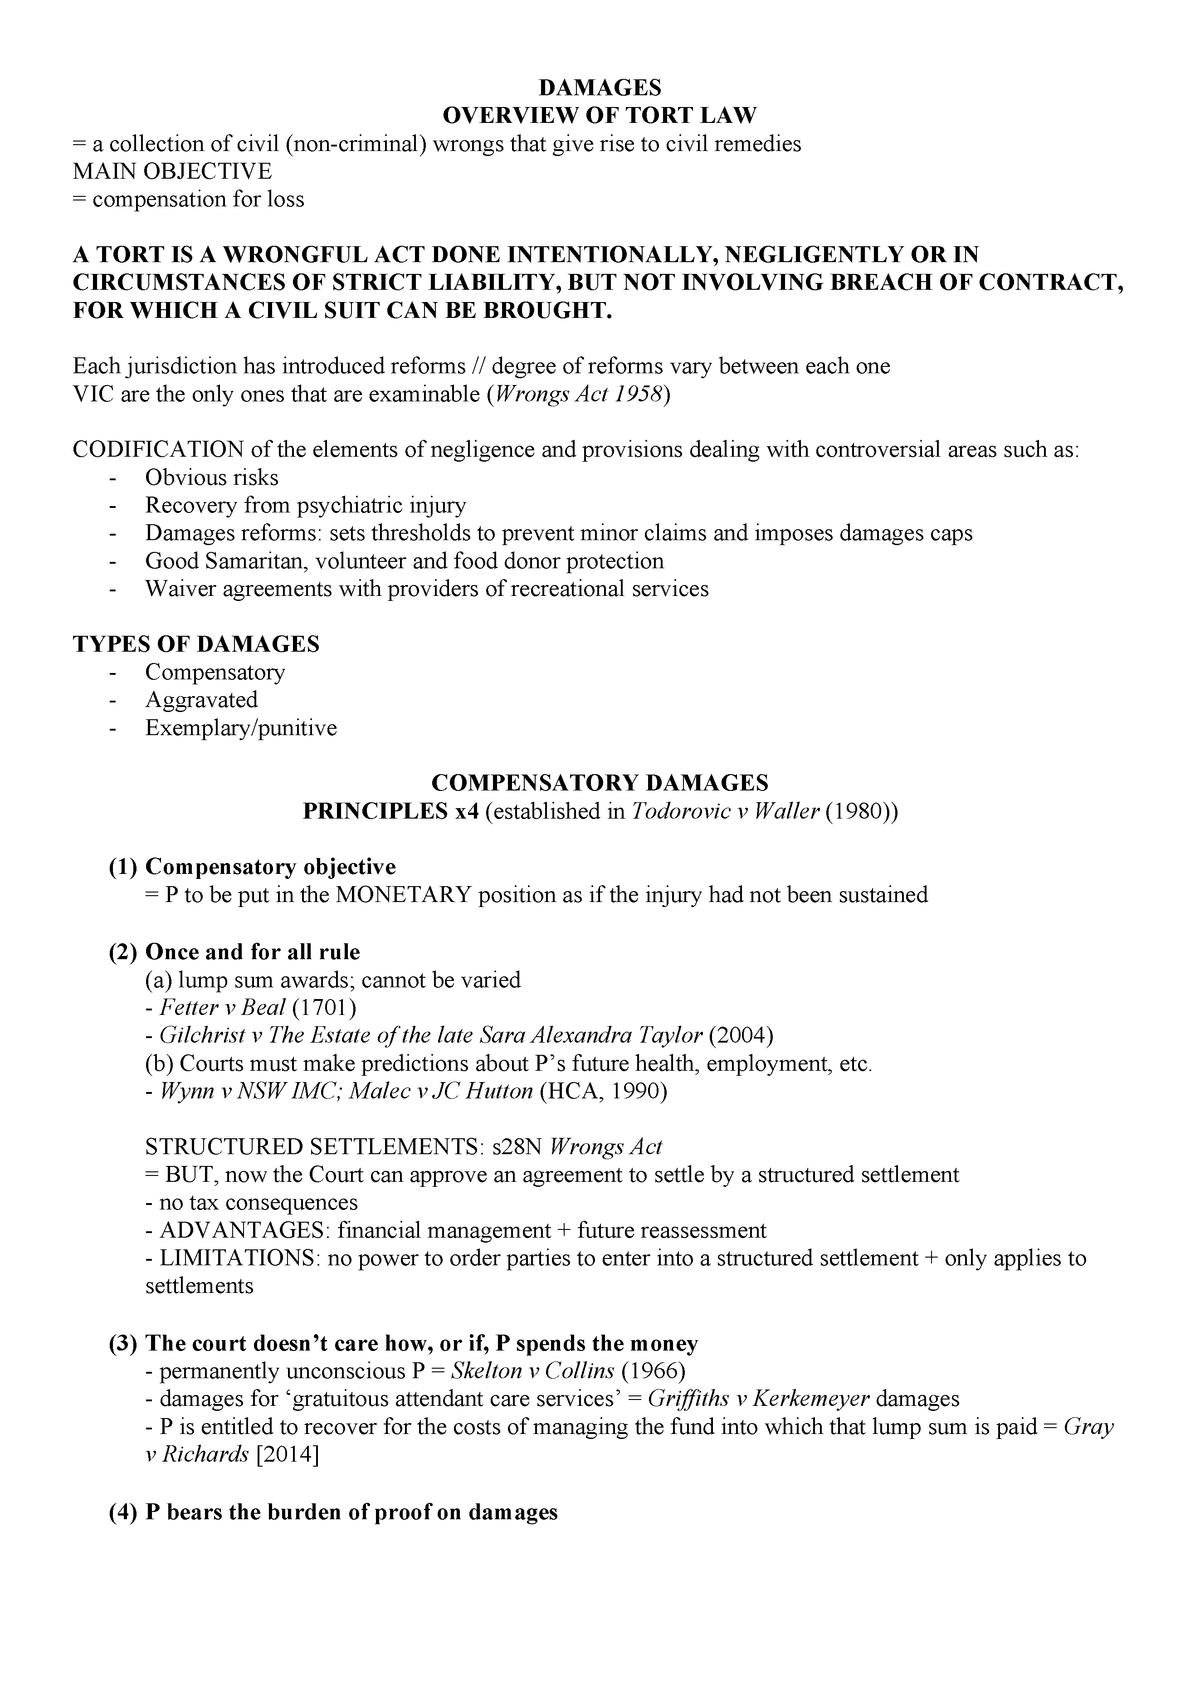 EXAM Notes - MLL213: Torts - StuDocu